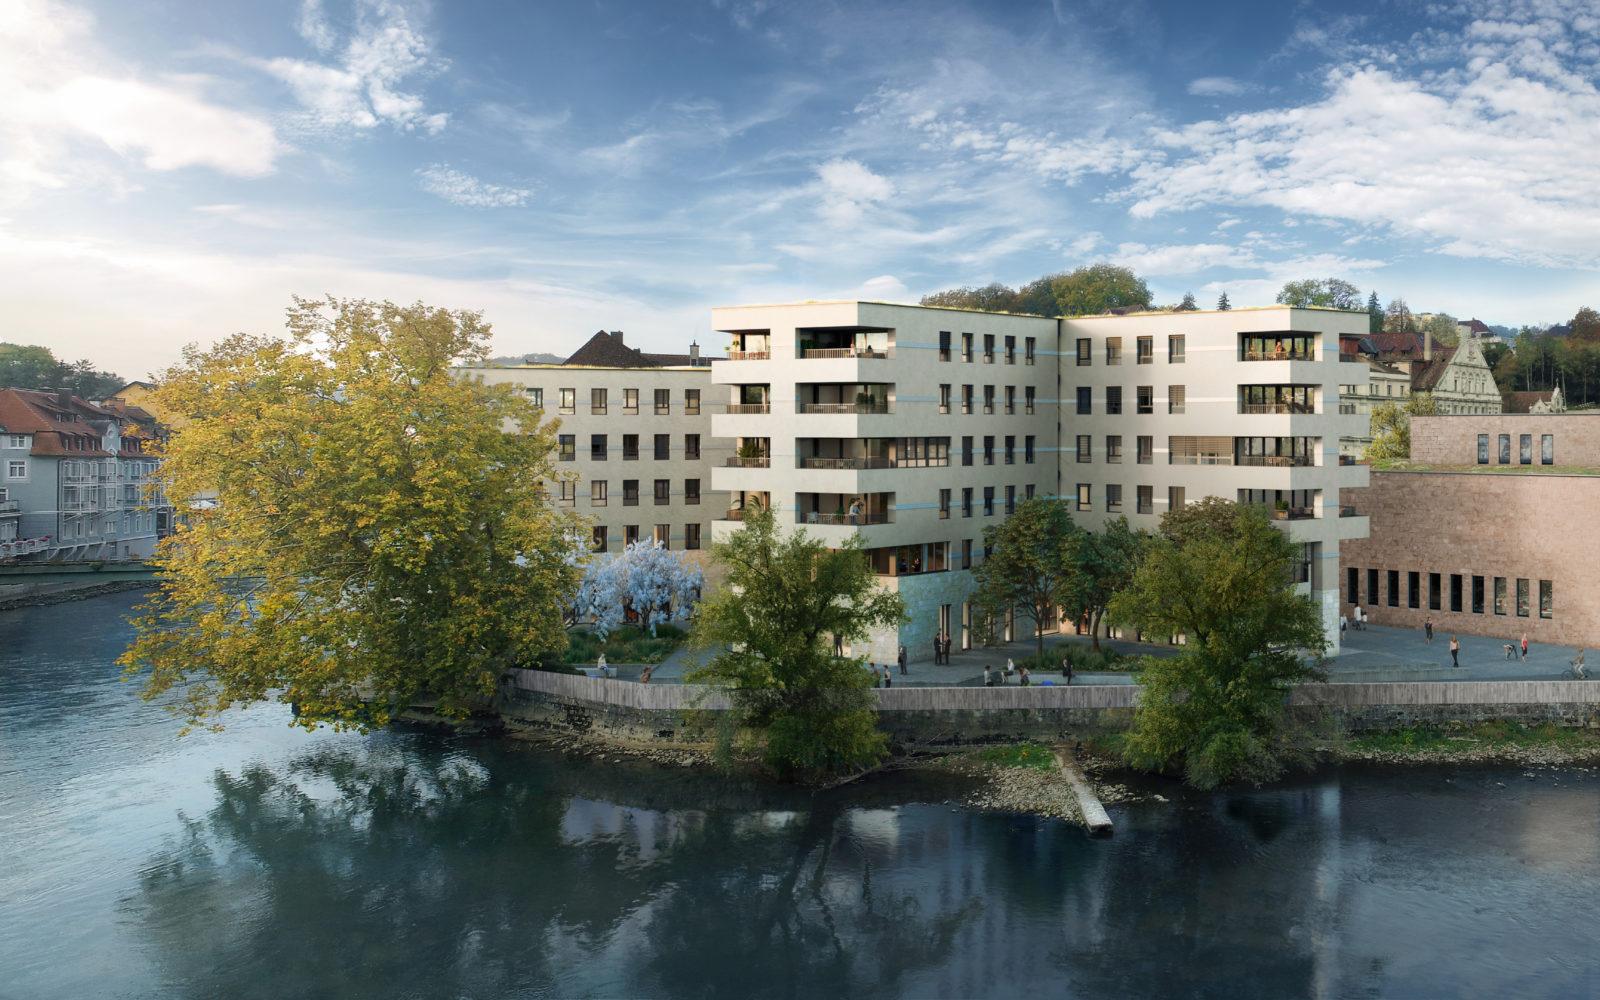 Aargau Baden Baden Residenz47 - Baden